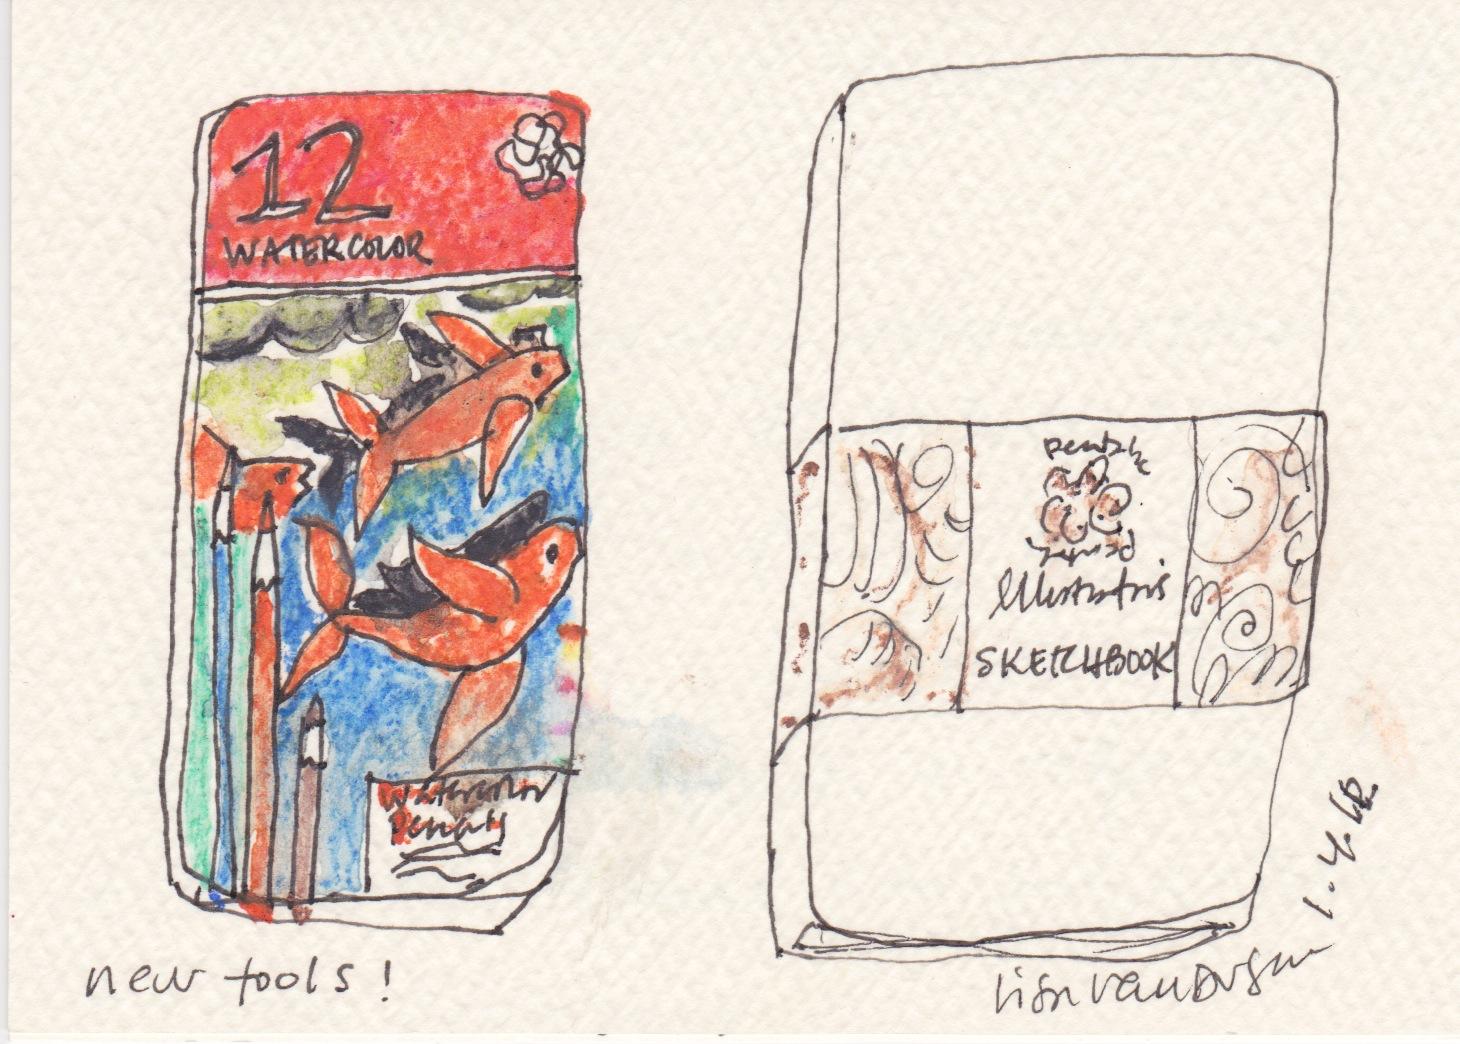 watercolor pencils + illustrator's sketchbook from Jennifer 1_5_12 1 copy.jpeg